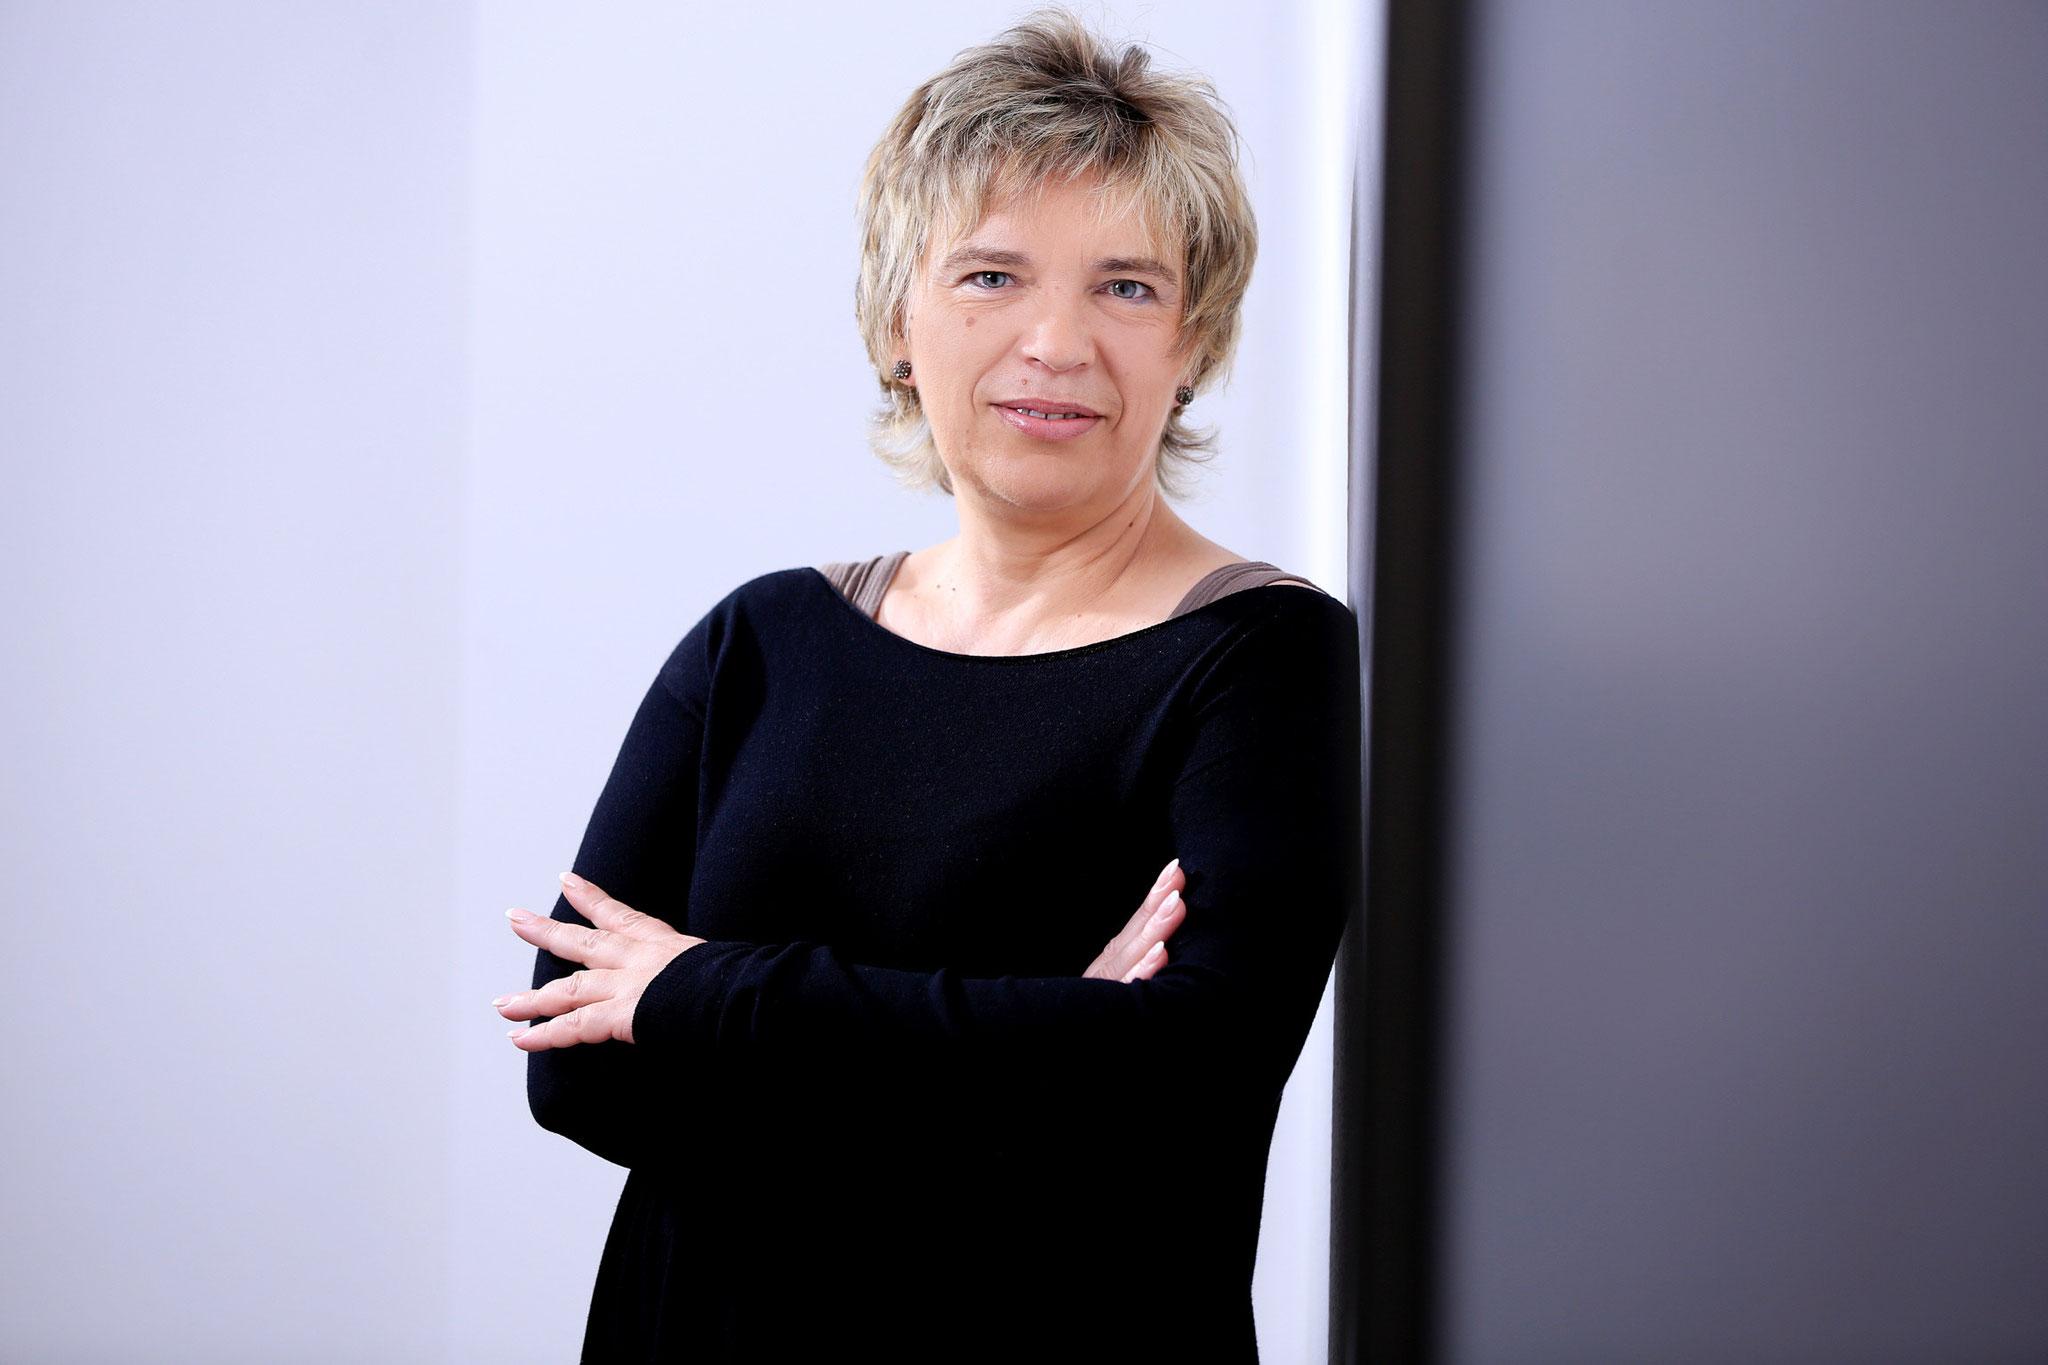 Manuela Savic, Geschäftsführung